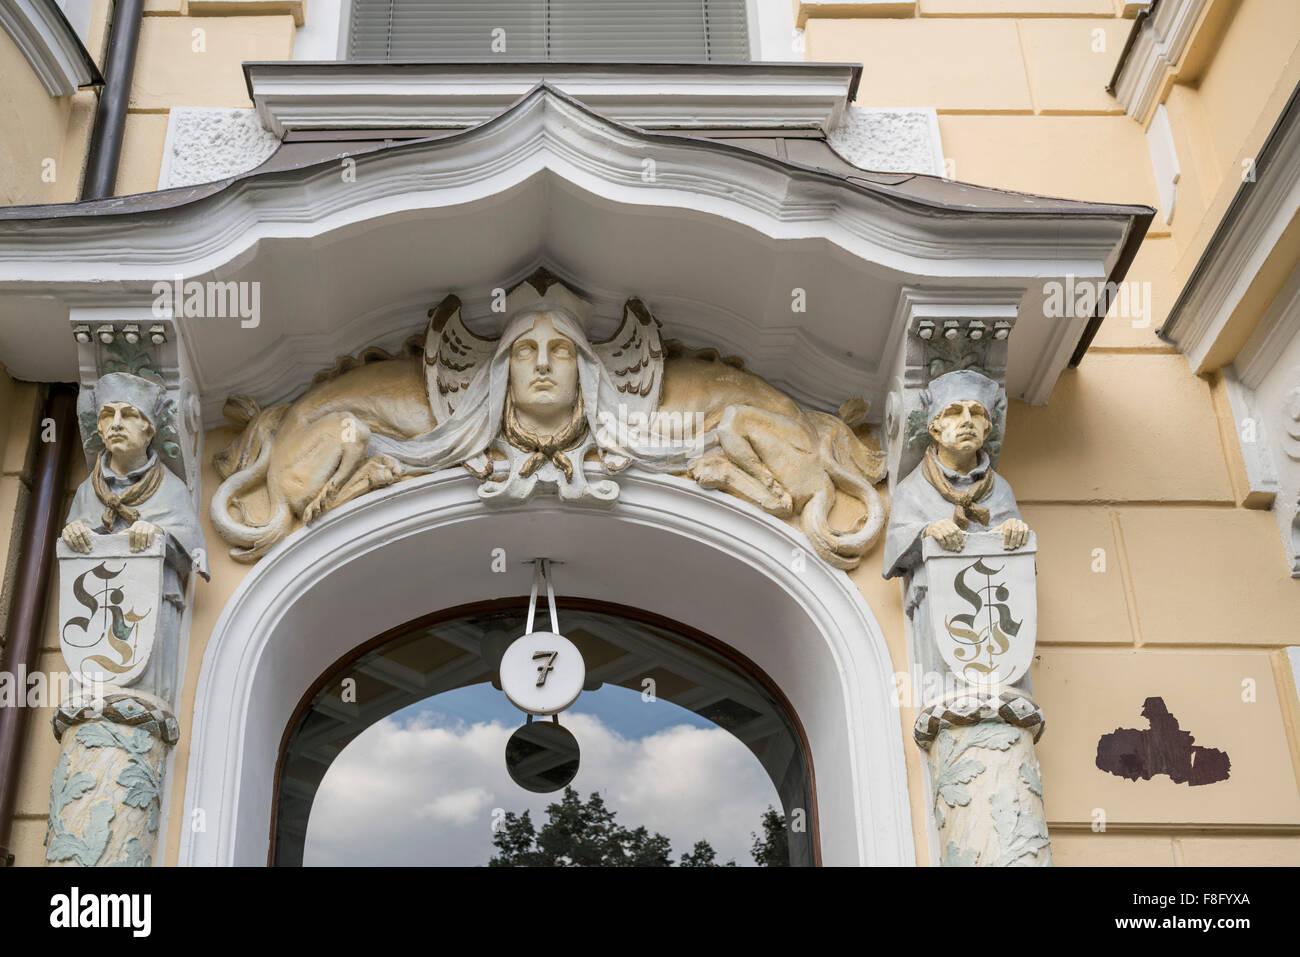 Real Estate, refurbished apartment house, entrance door with figures,  Victoria Luise Platz, Schoeneberg, Berlin - Stock Image